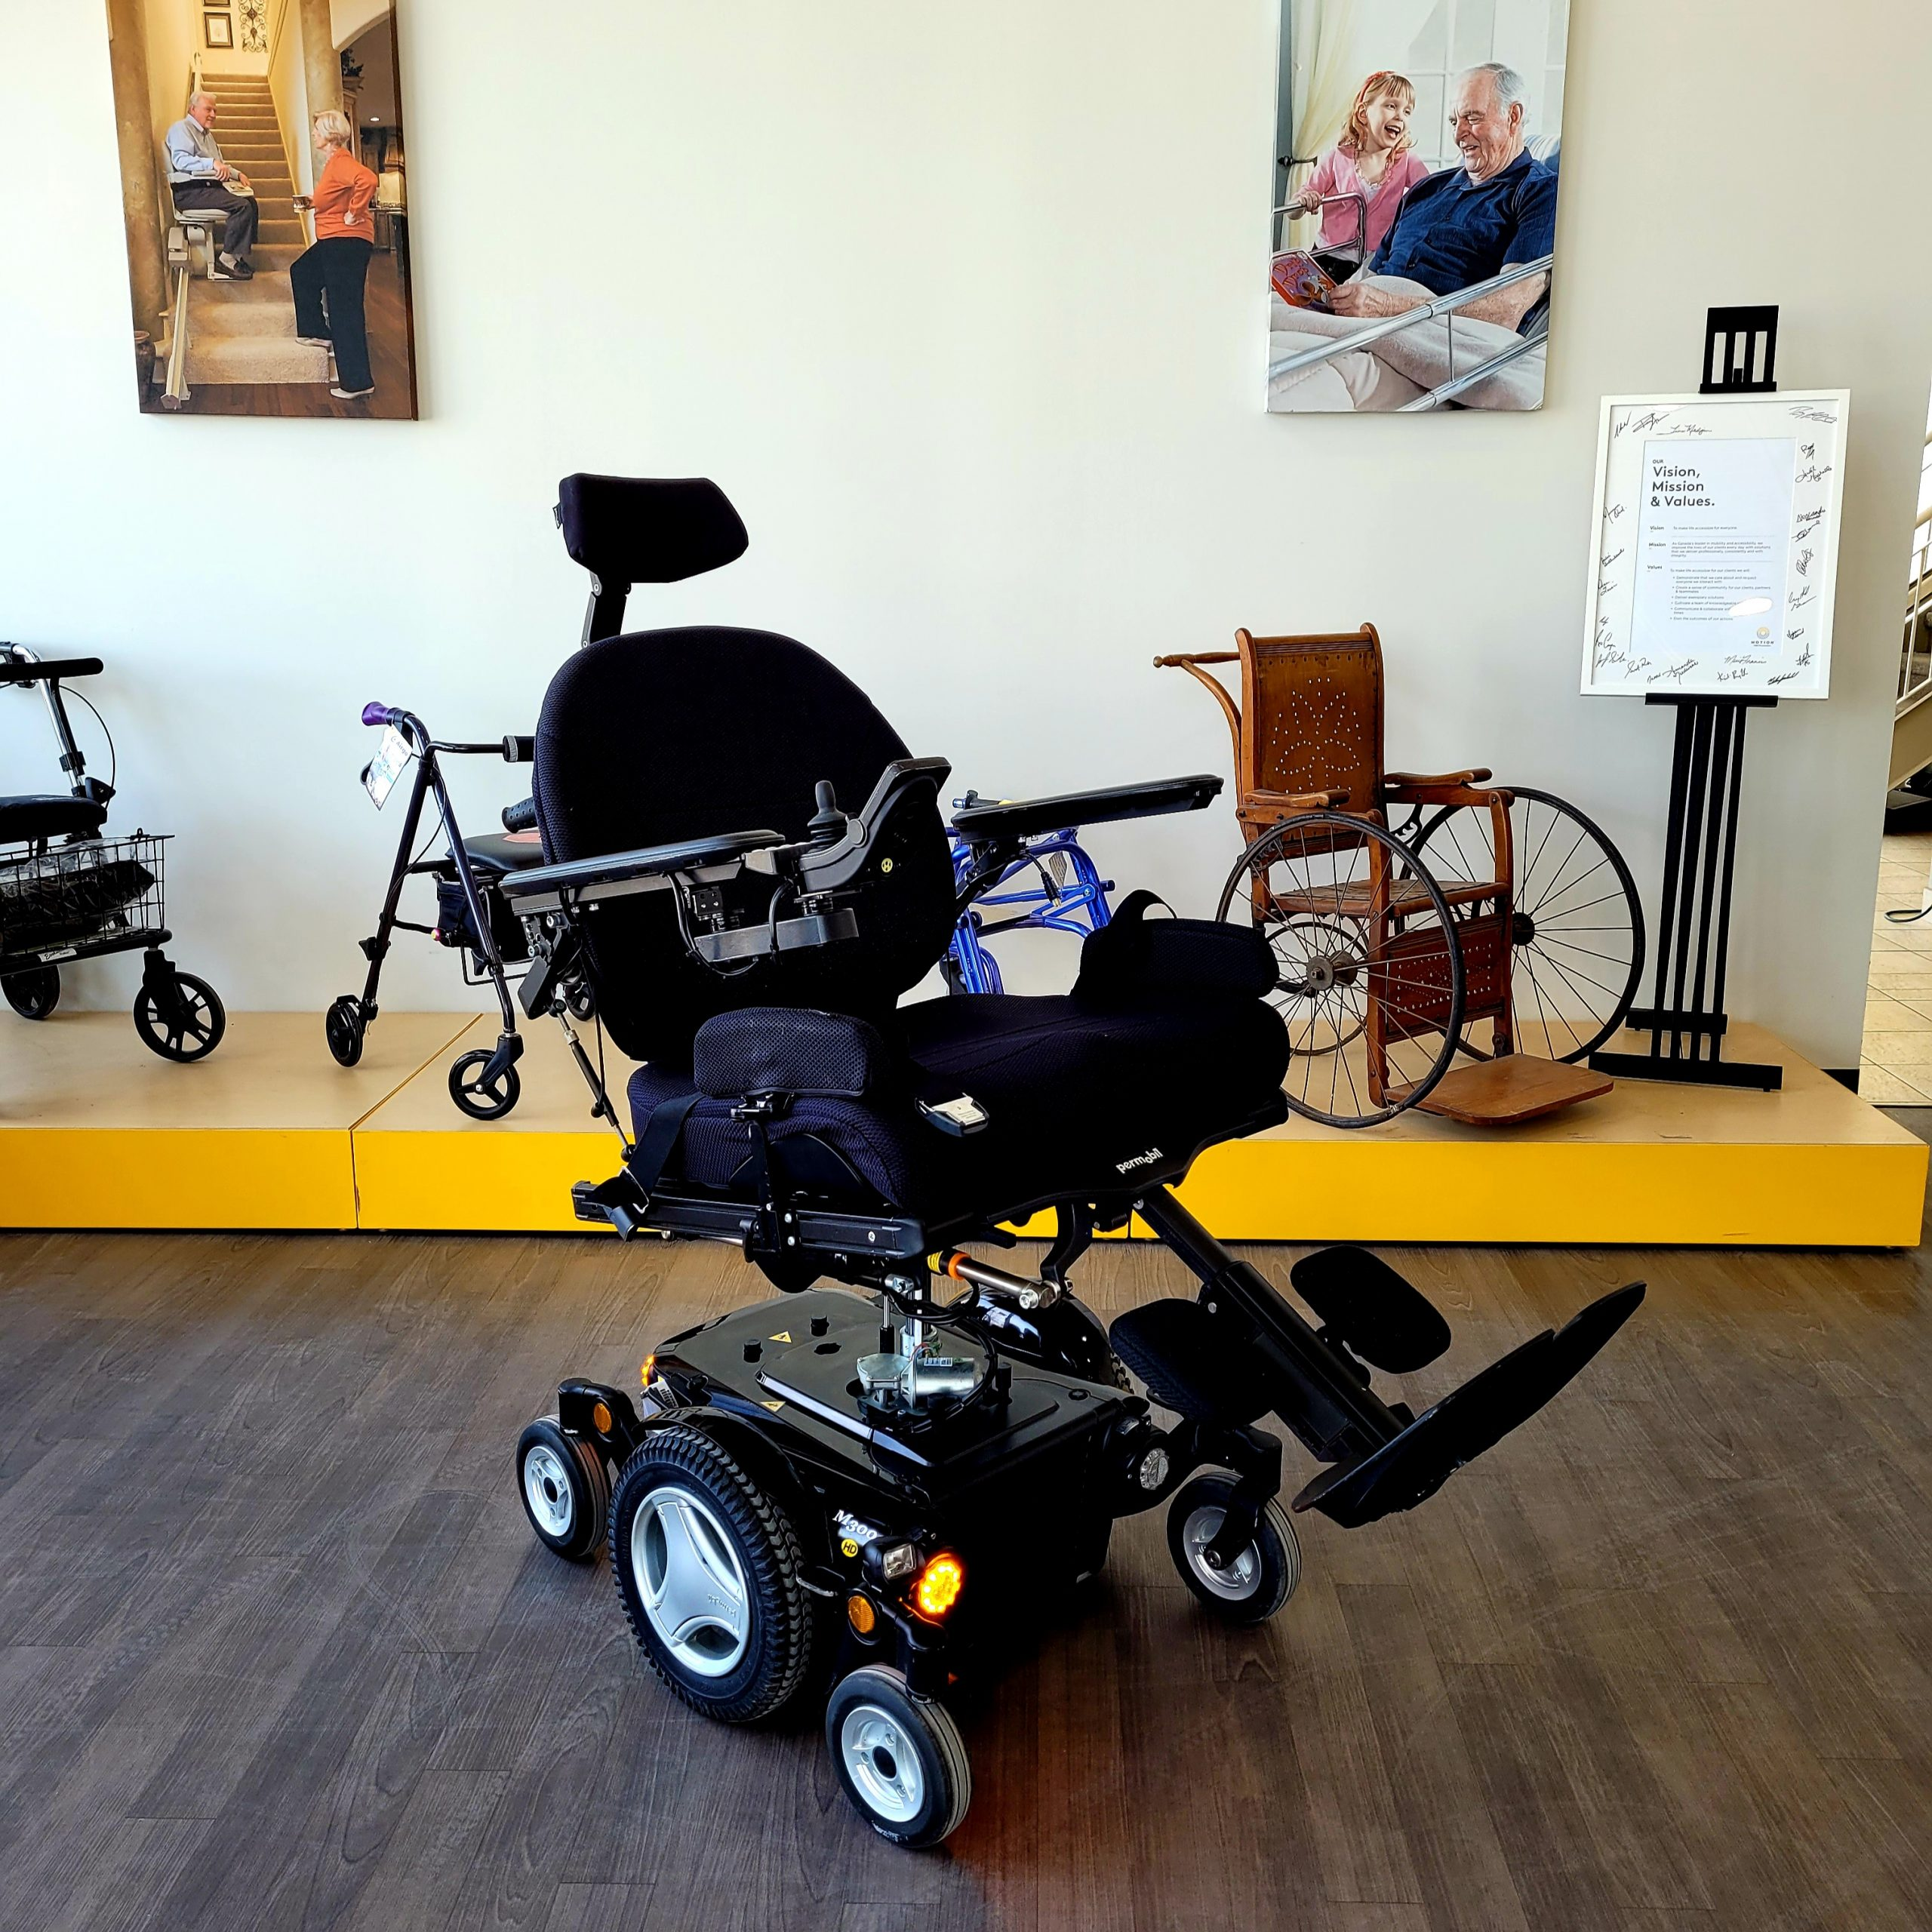 Barroe showroom - power wheelchair display